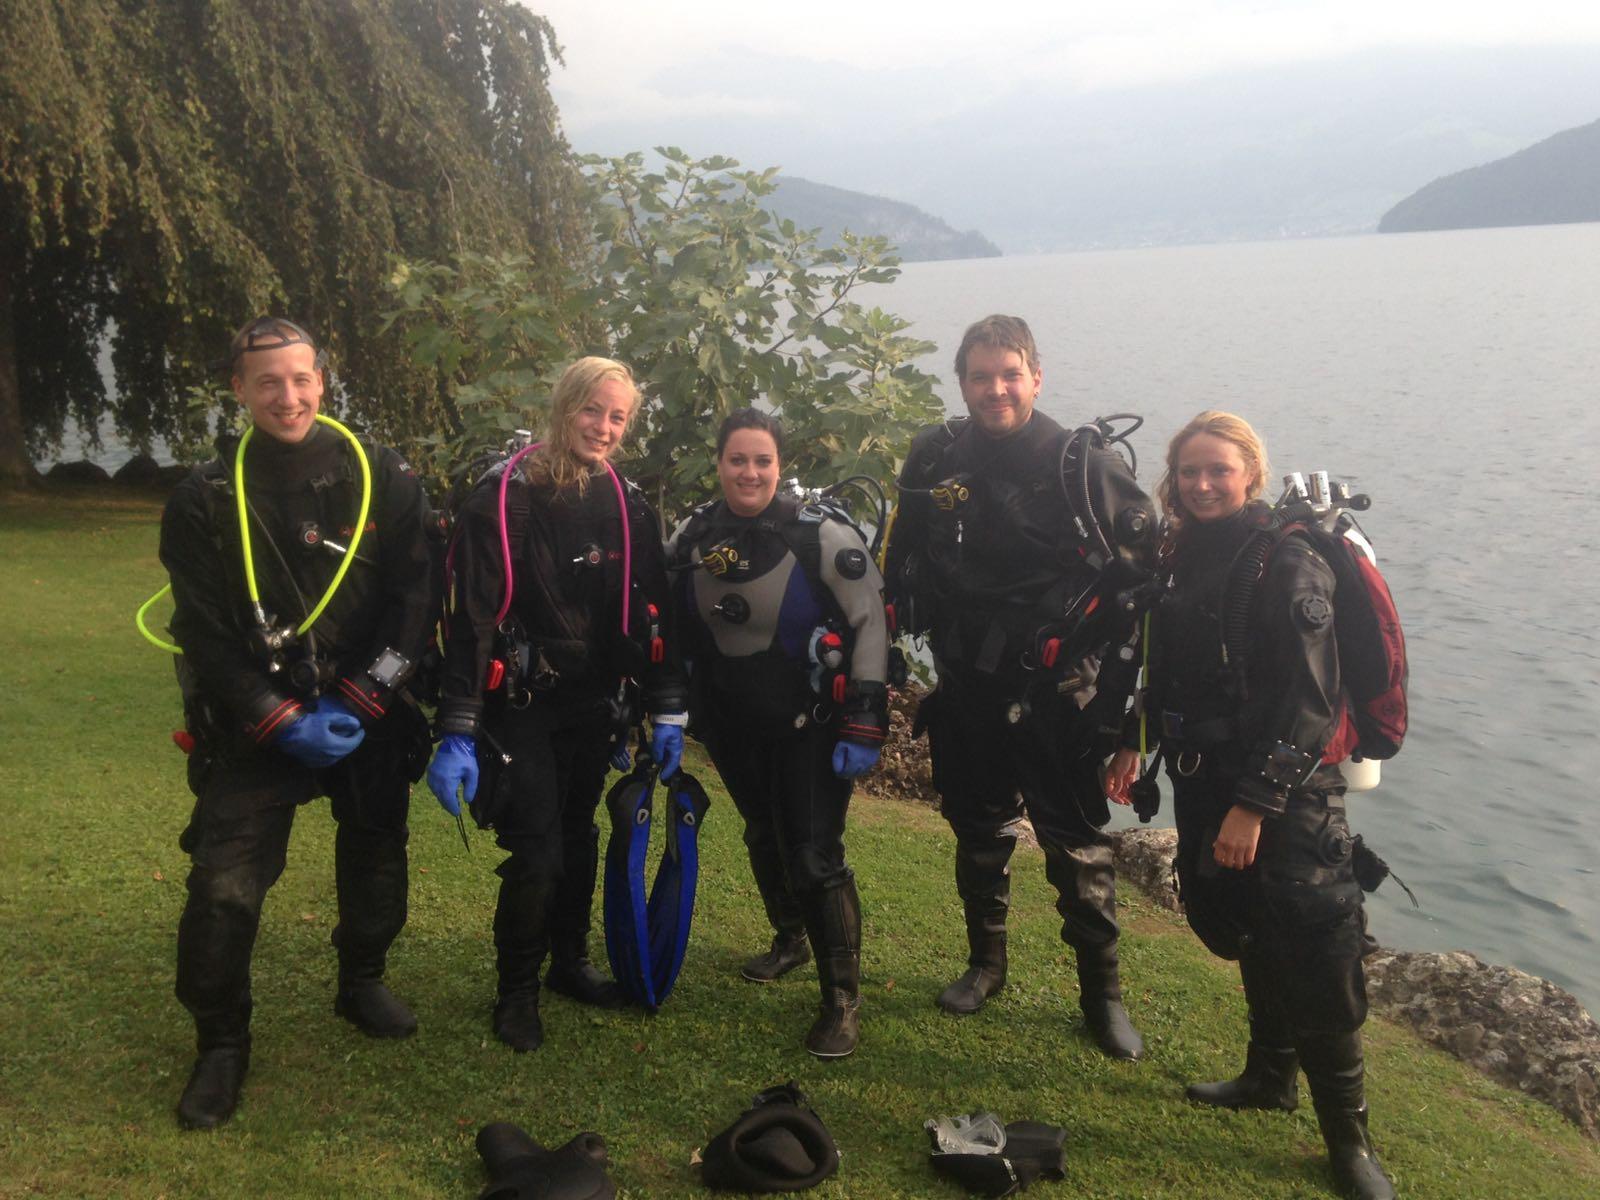 rescue-diver-kurs-nebel-weber-20161031